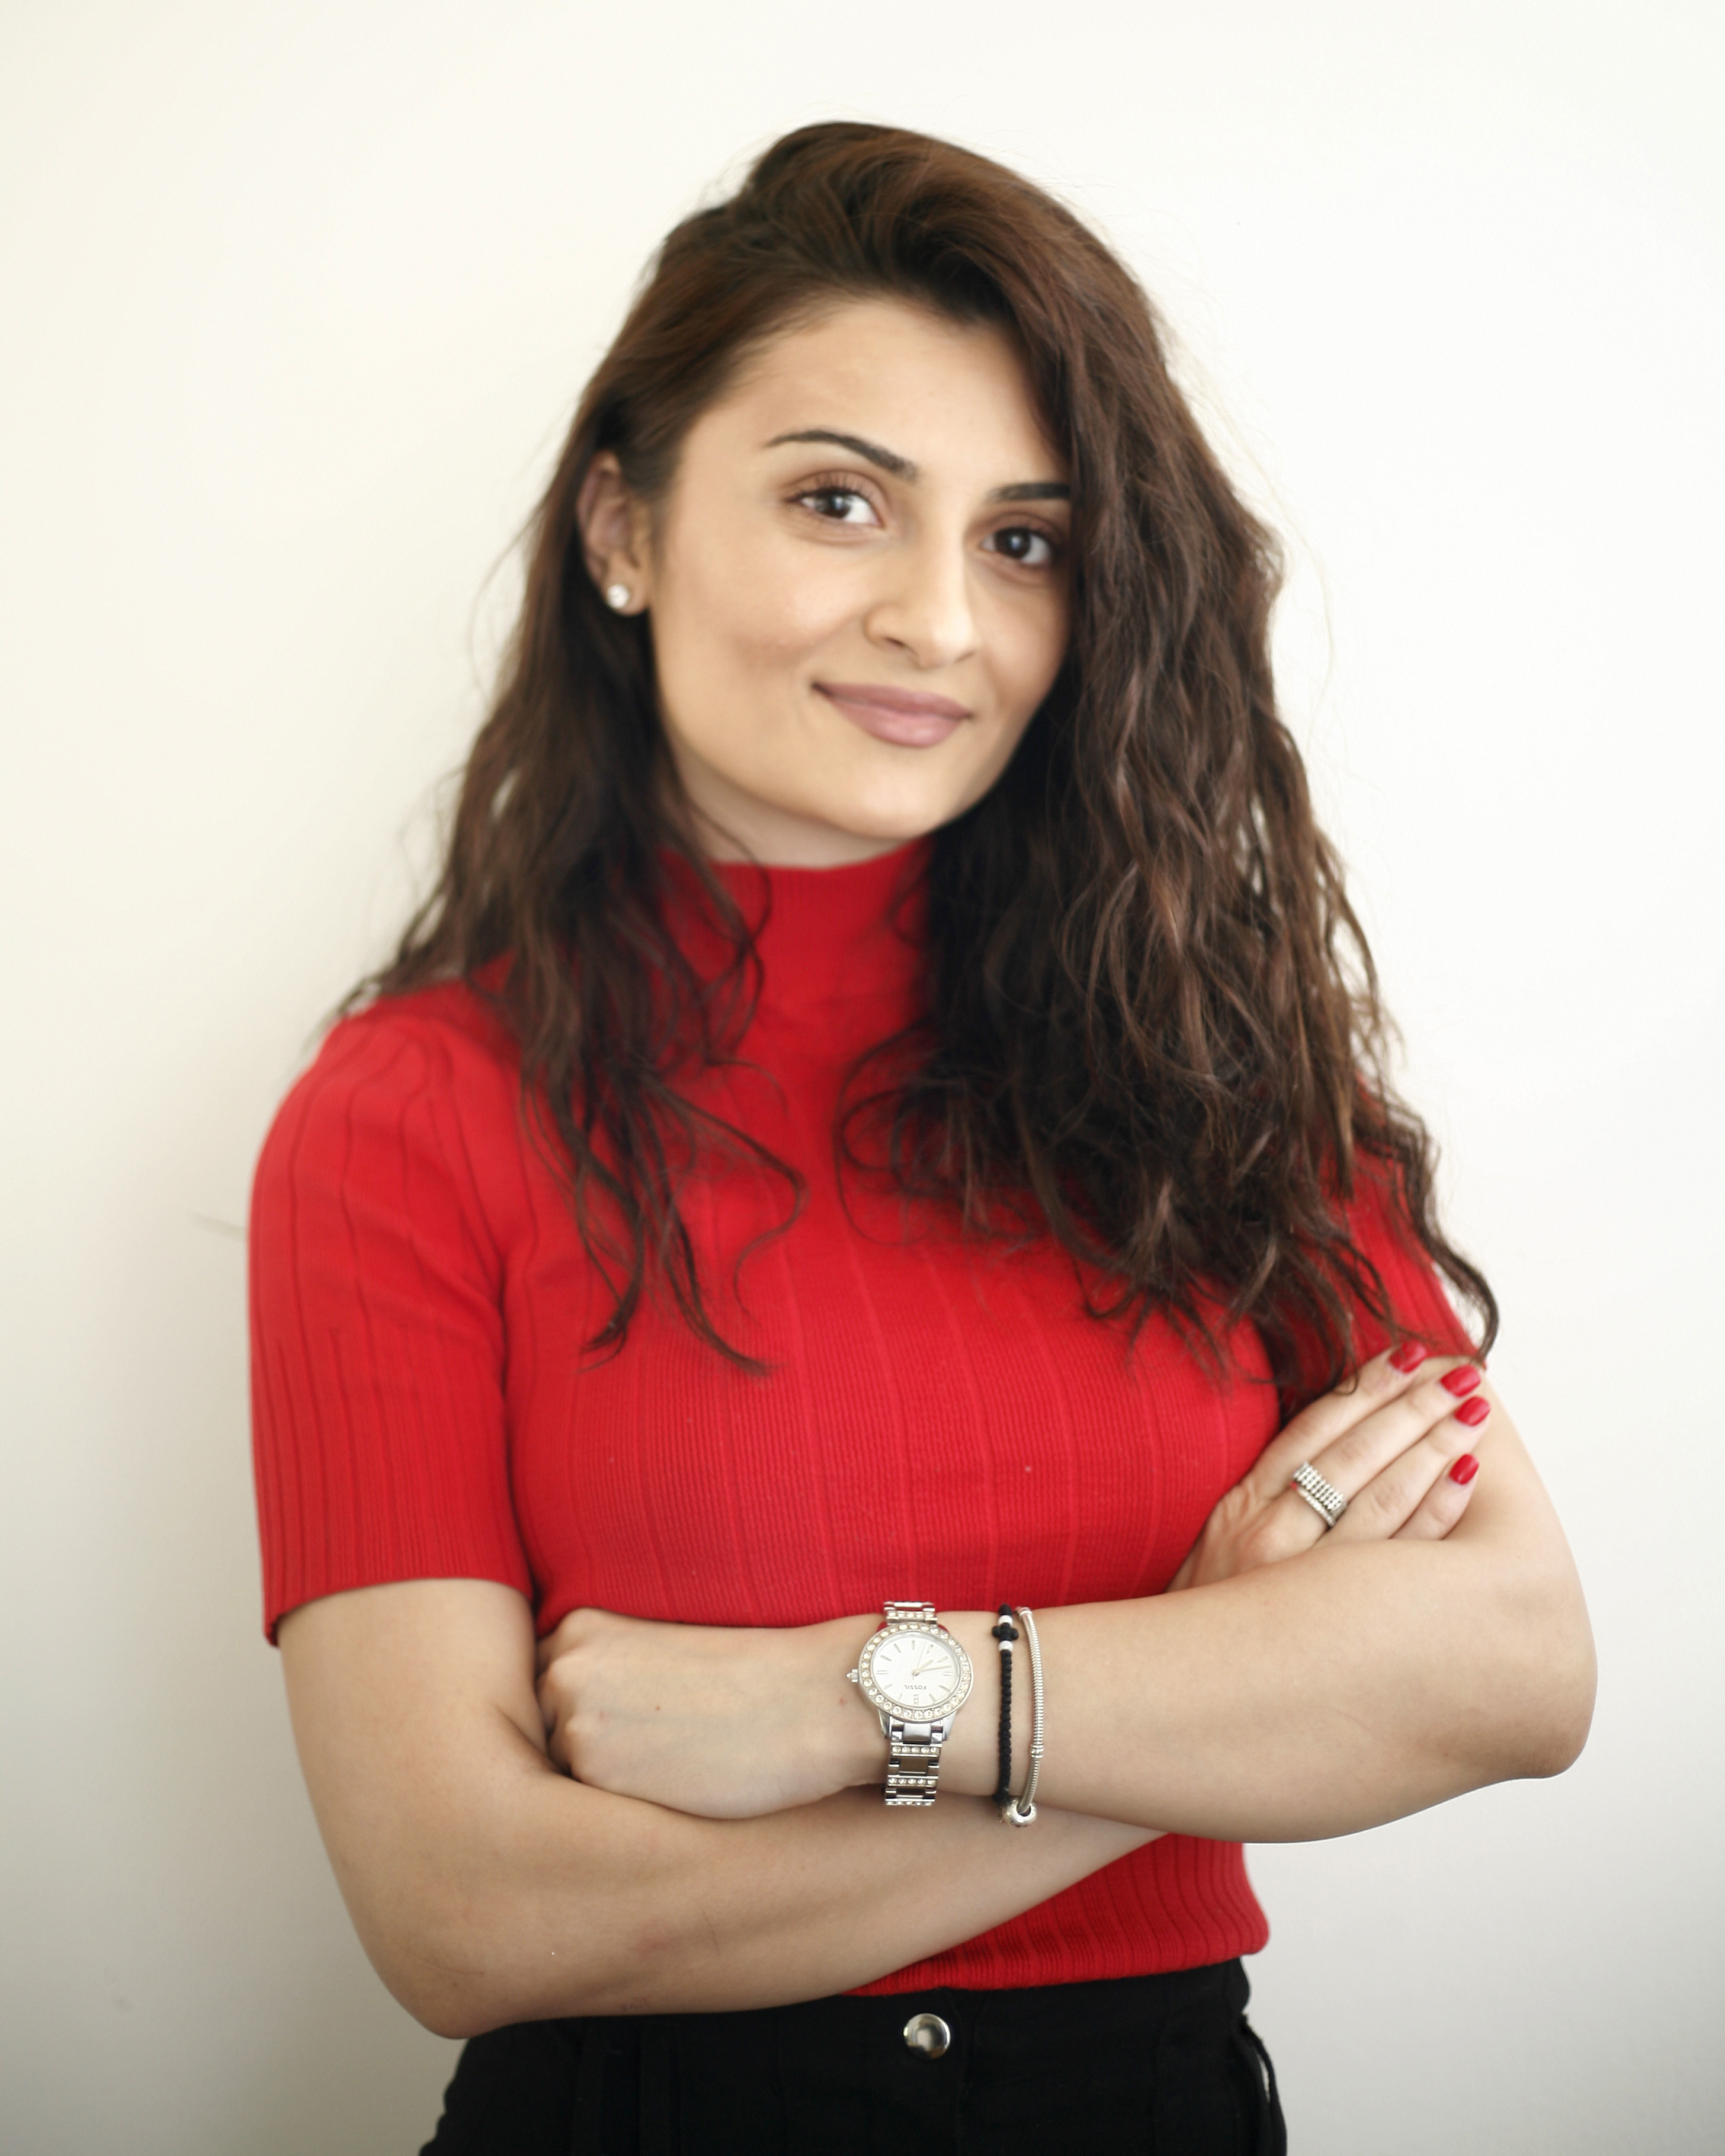 Nevena Đoković